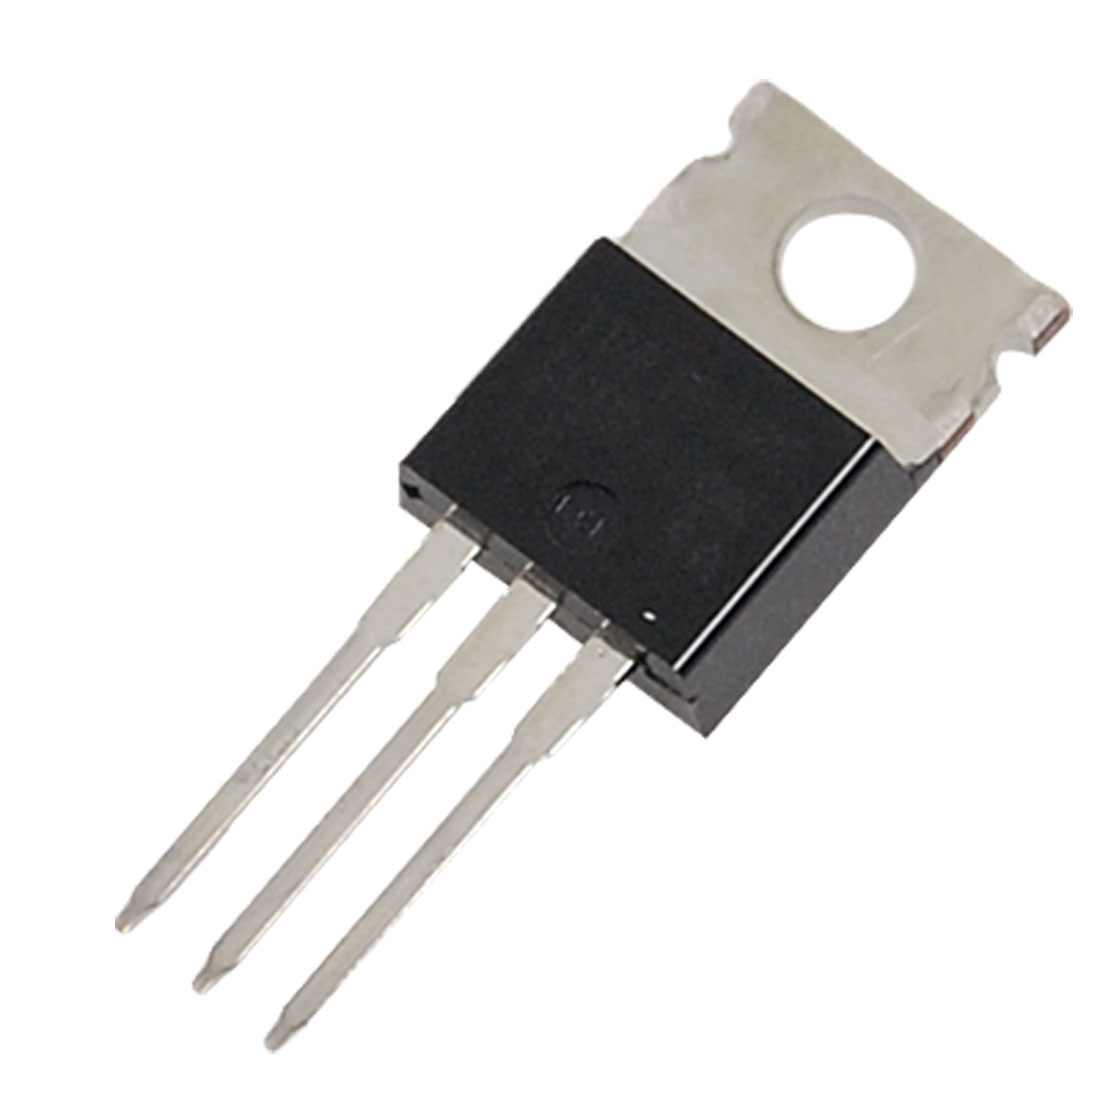 60V 80A 3 Pin Terminals Semiconductor Triode Transistor 1RF1010E